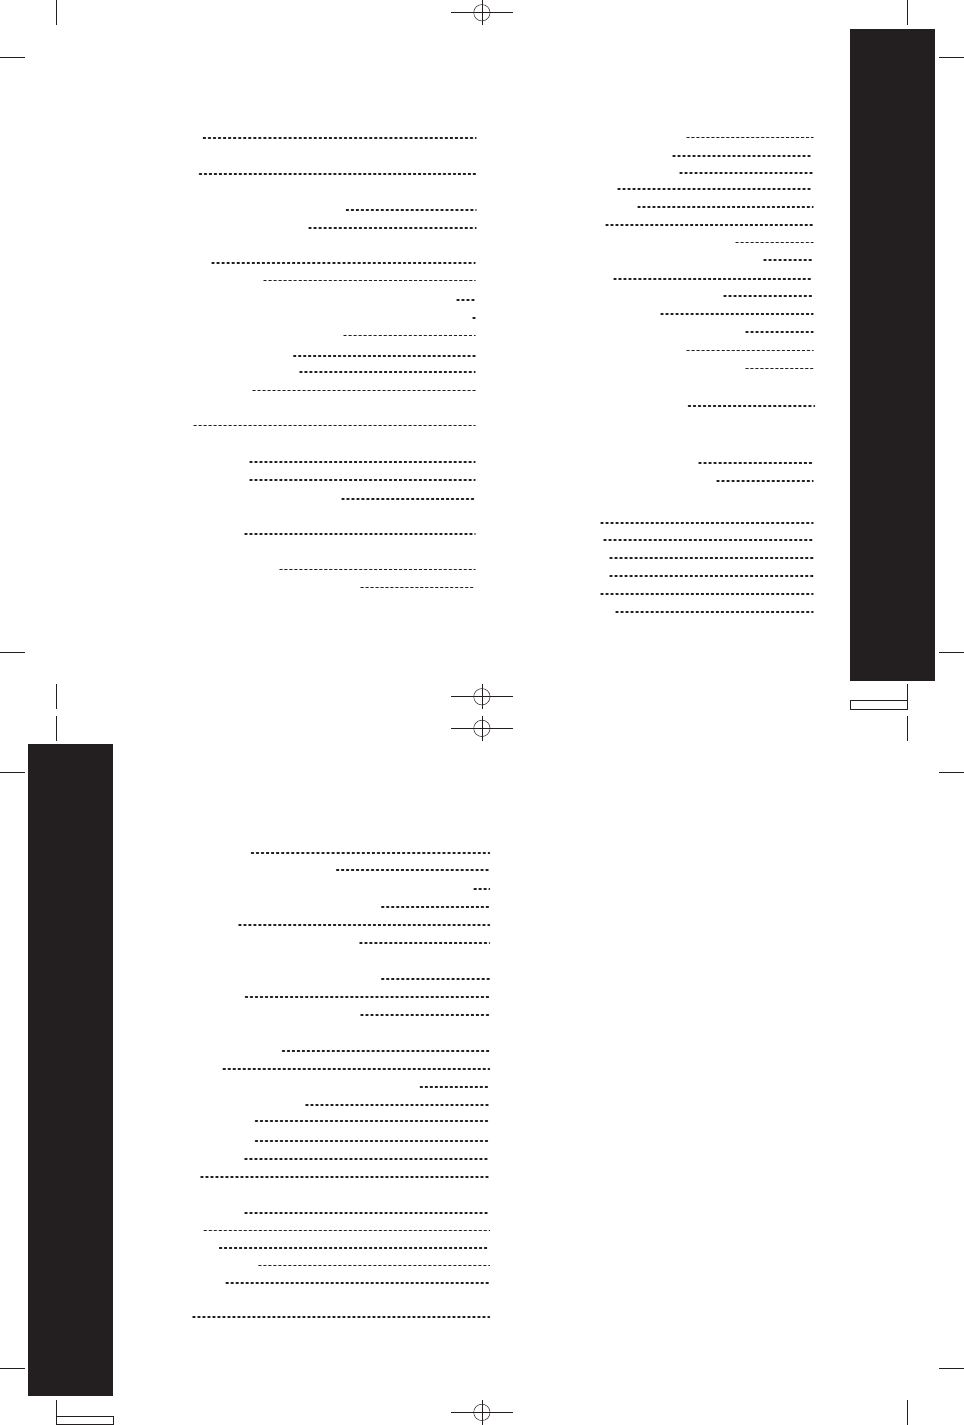 Handleiding Motorola ME4050 (pagina 8 van 24) (English)